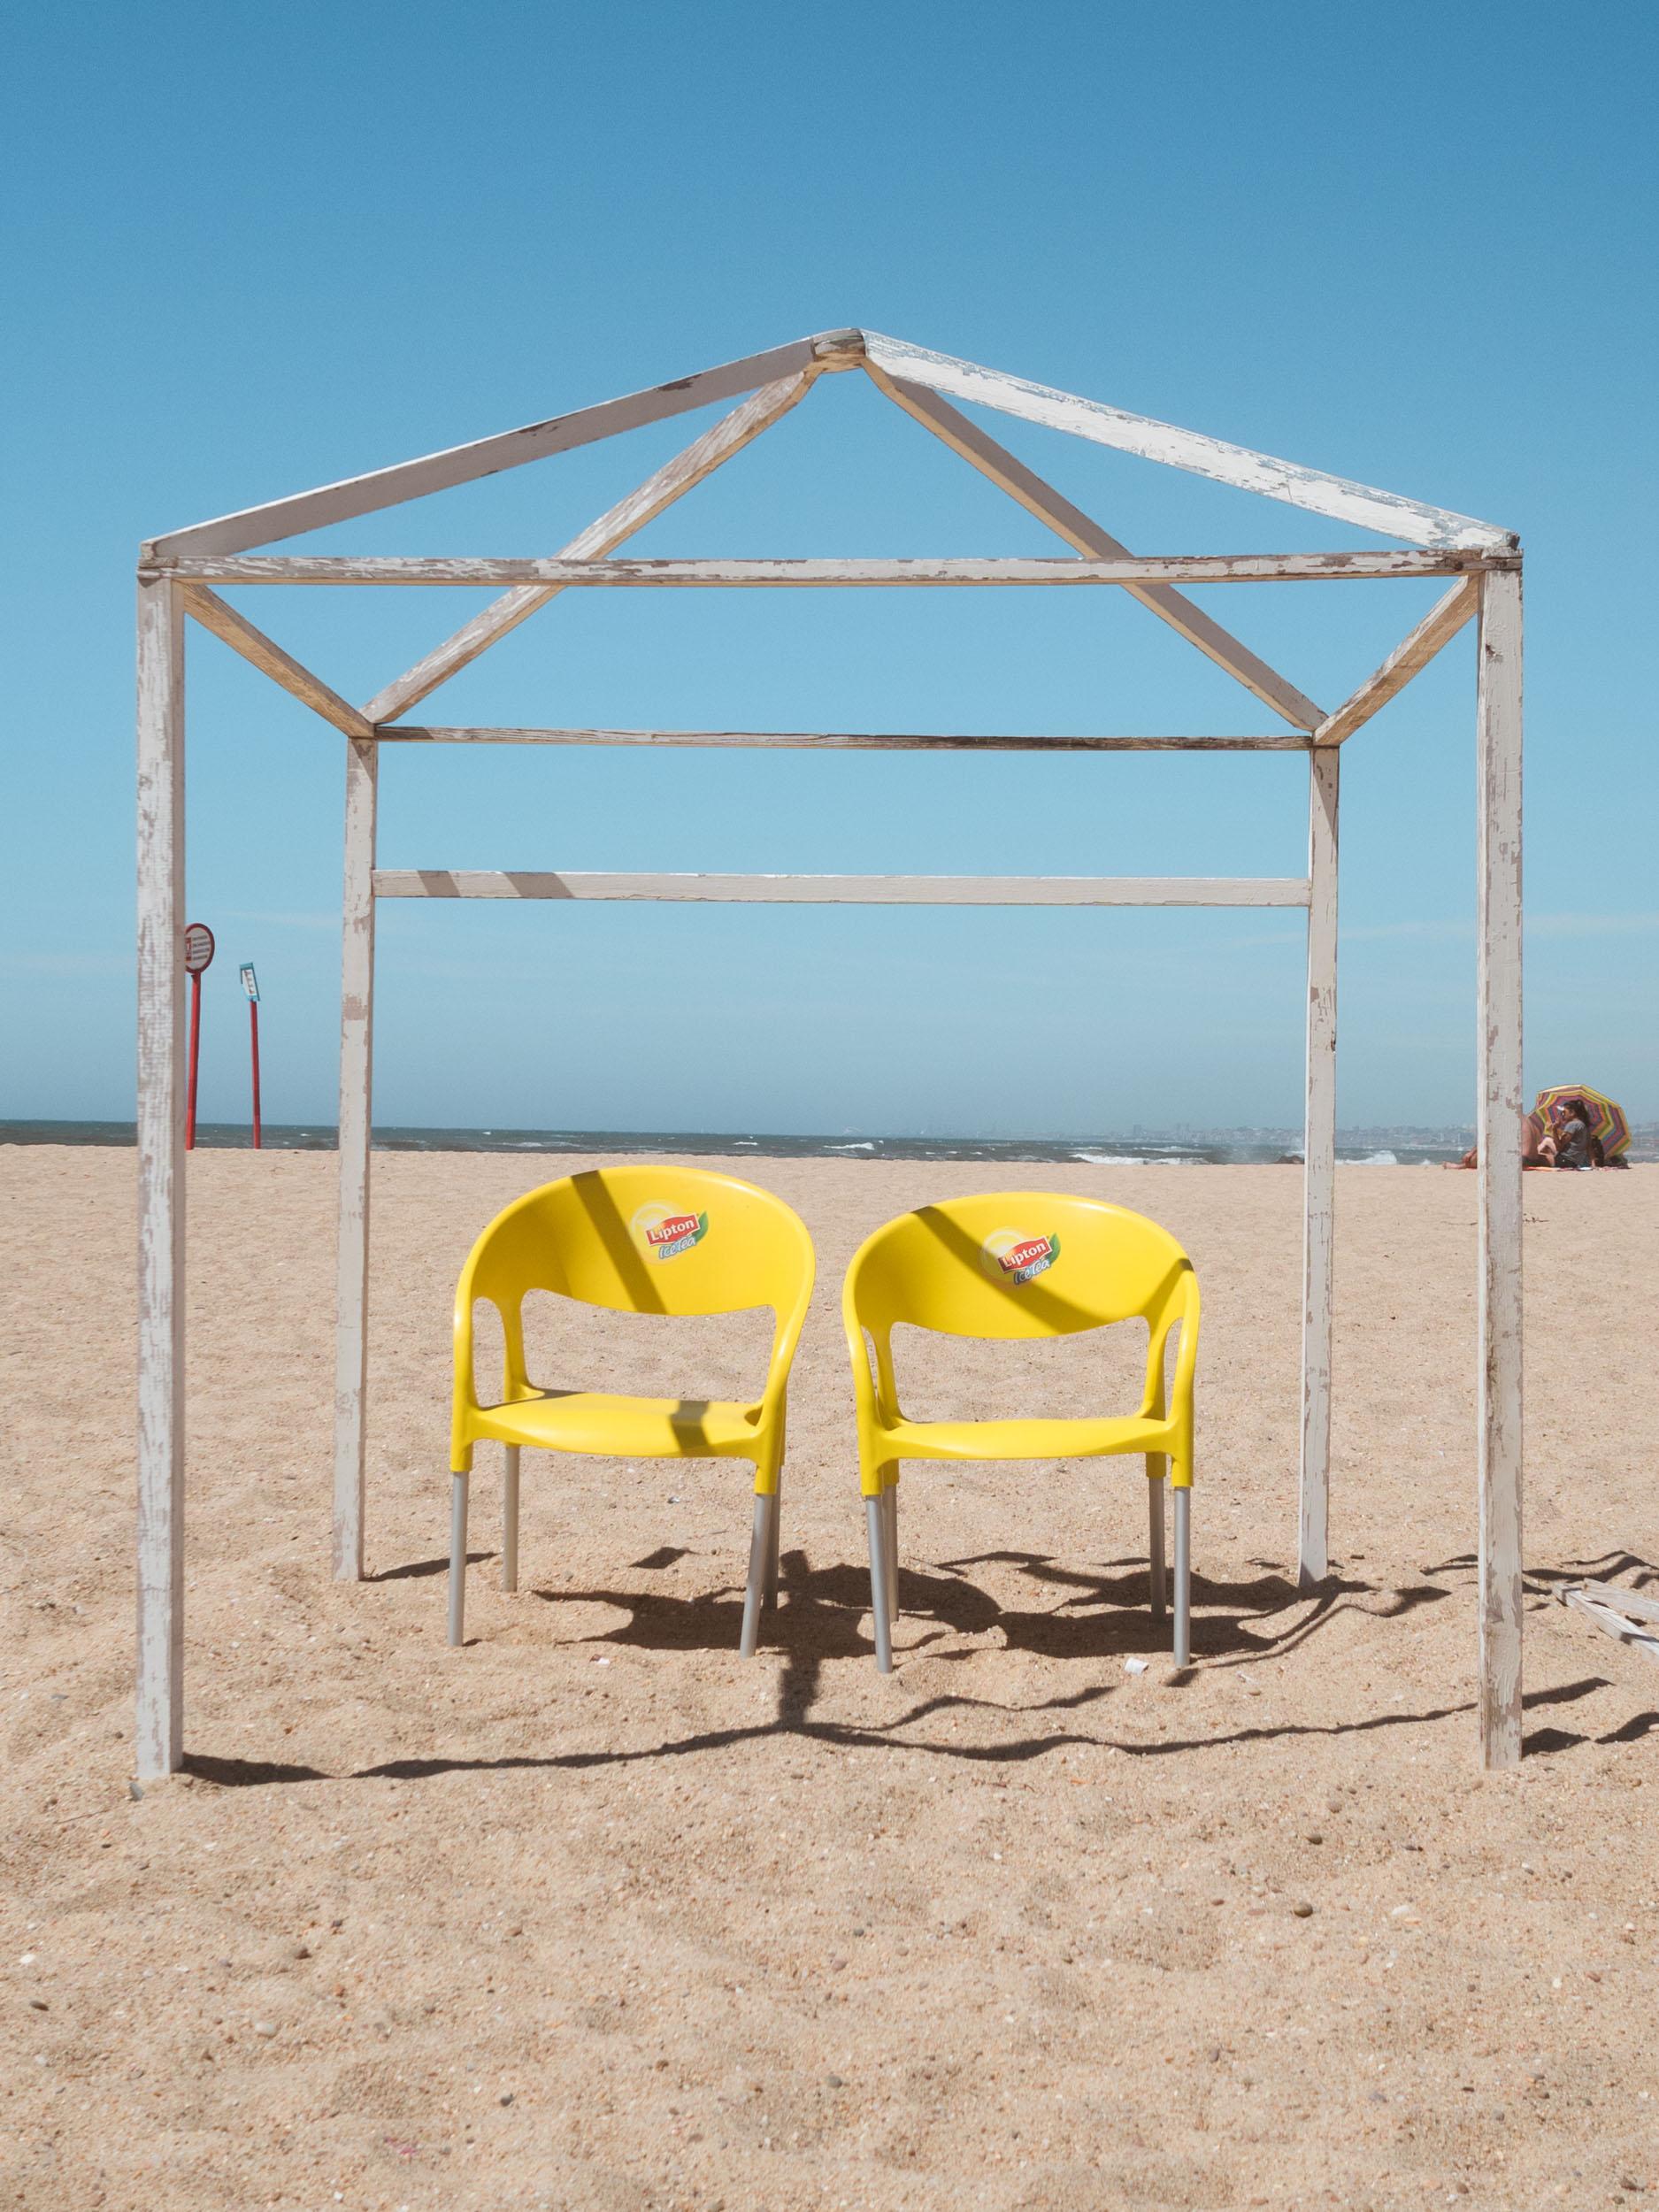 Beach chairs on Praia do Senhor da Pedra near Porto in Portugal.